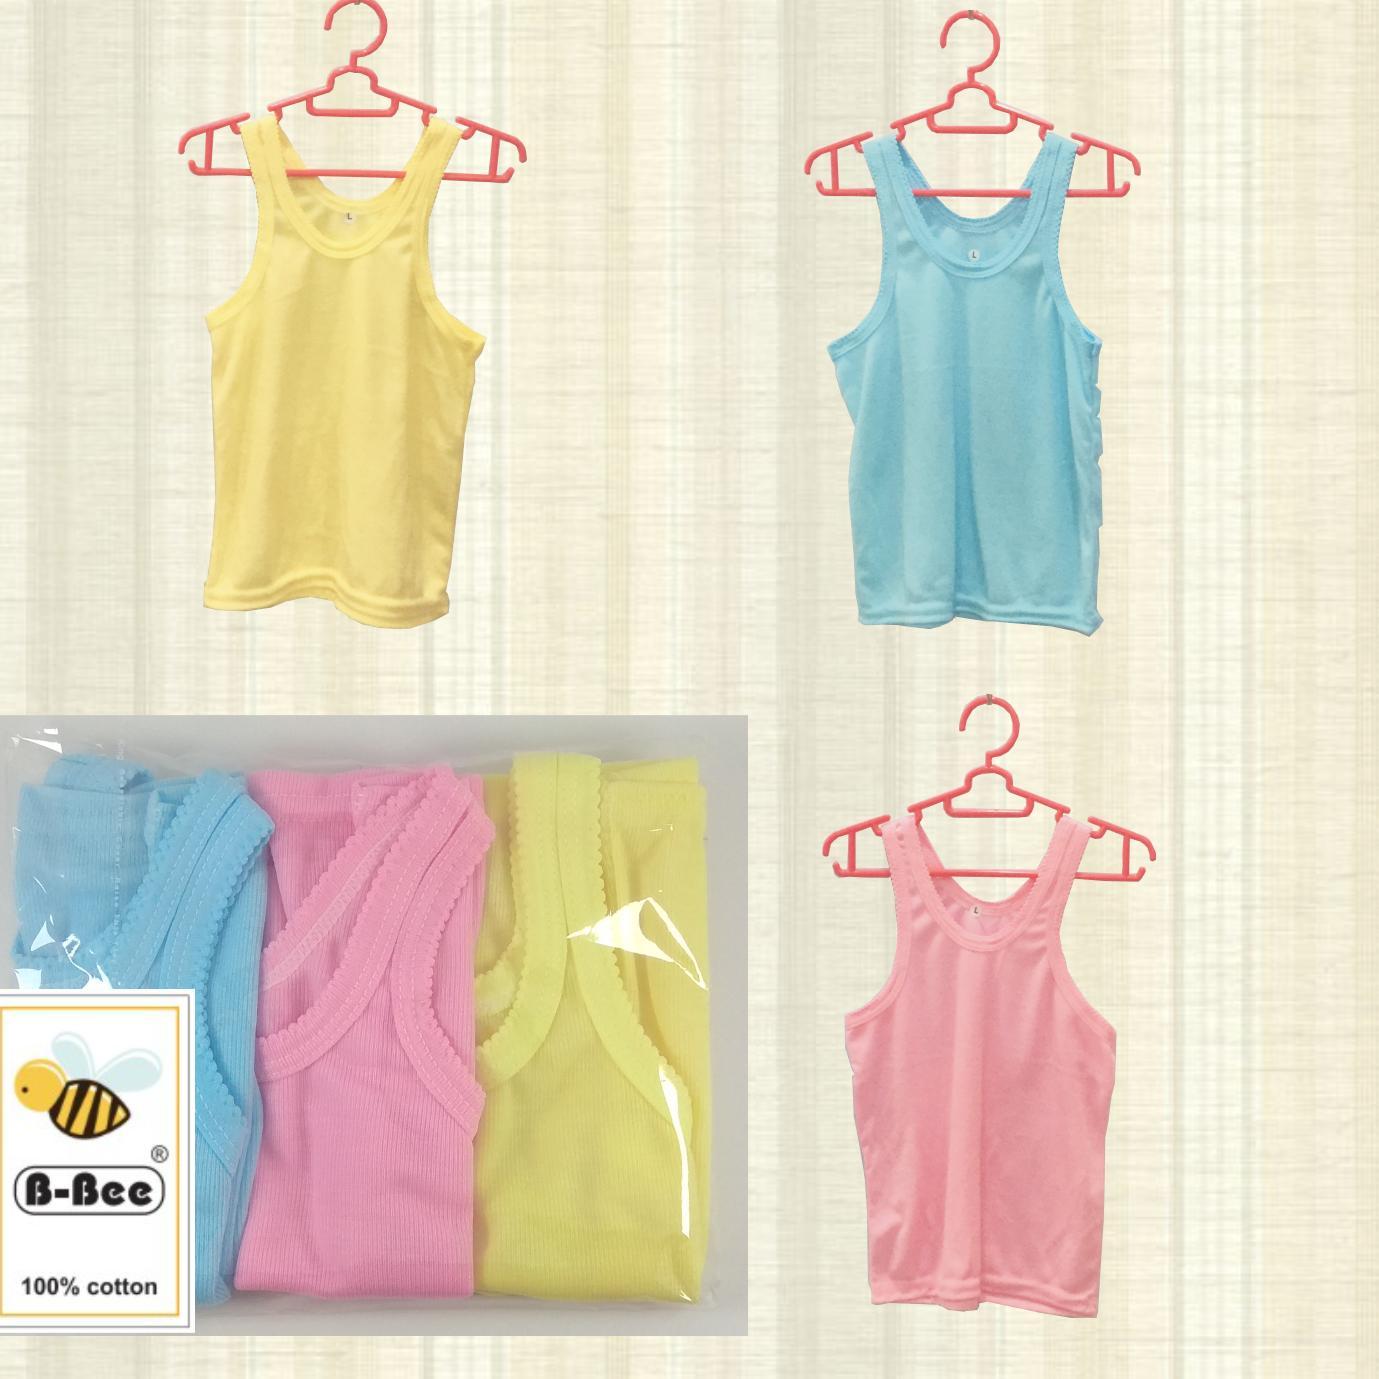 Baju Singlet Oblong Bayi Baby New Born B-Bee Cotton  Isi 6 Pcs